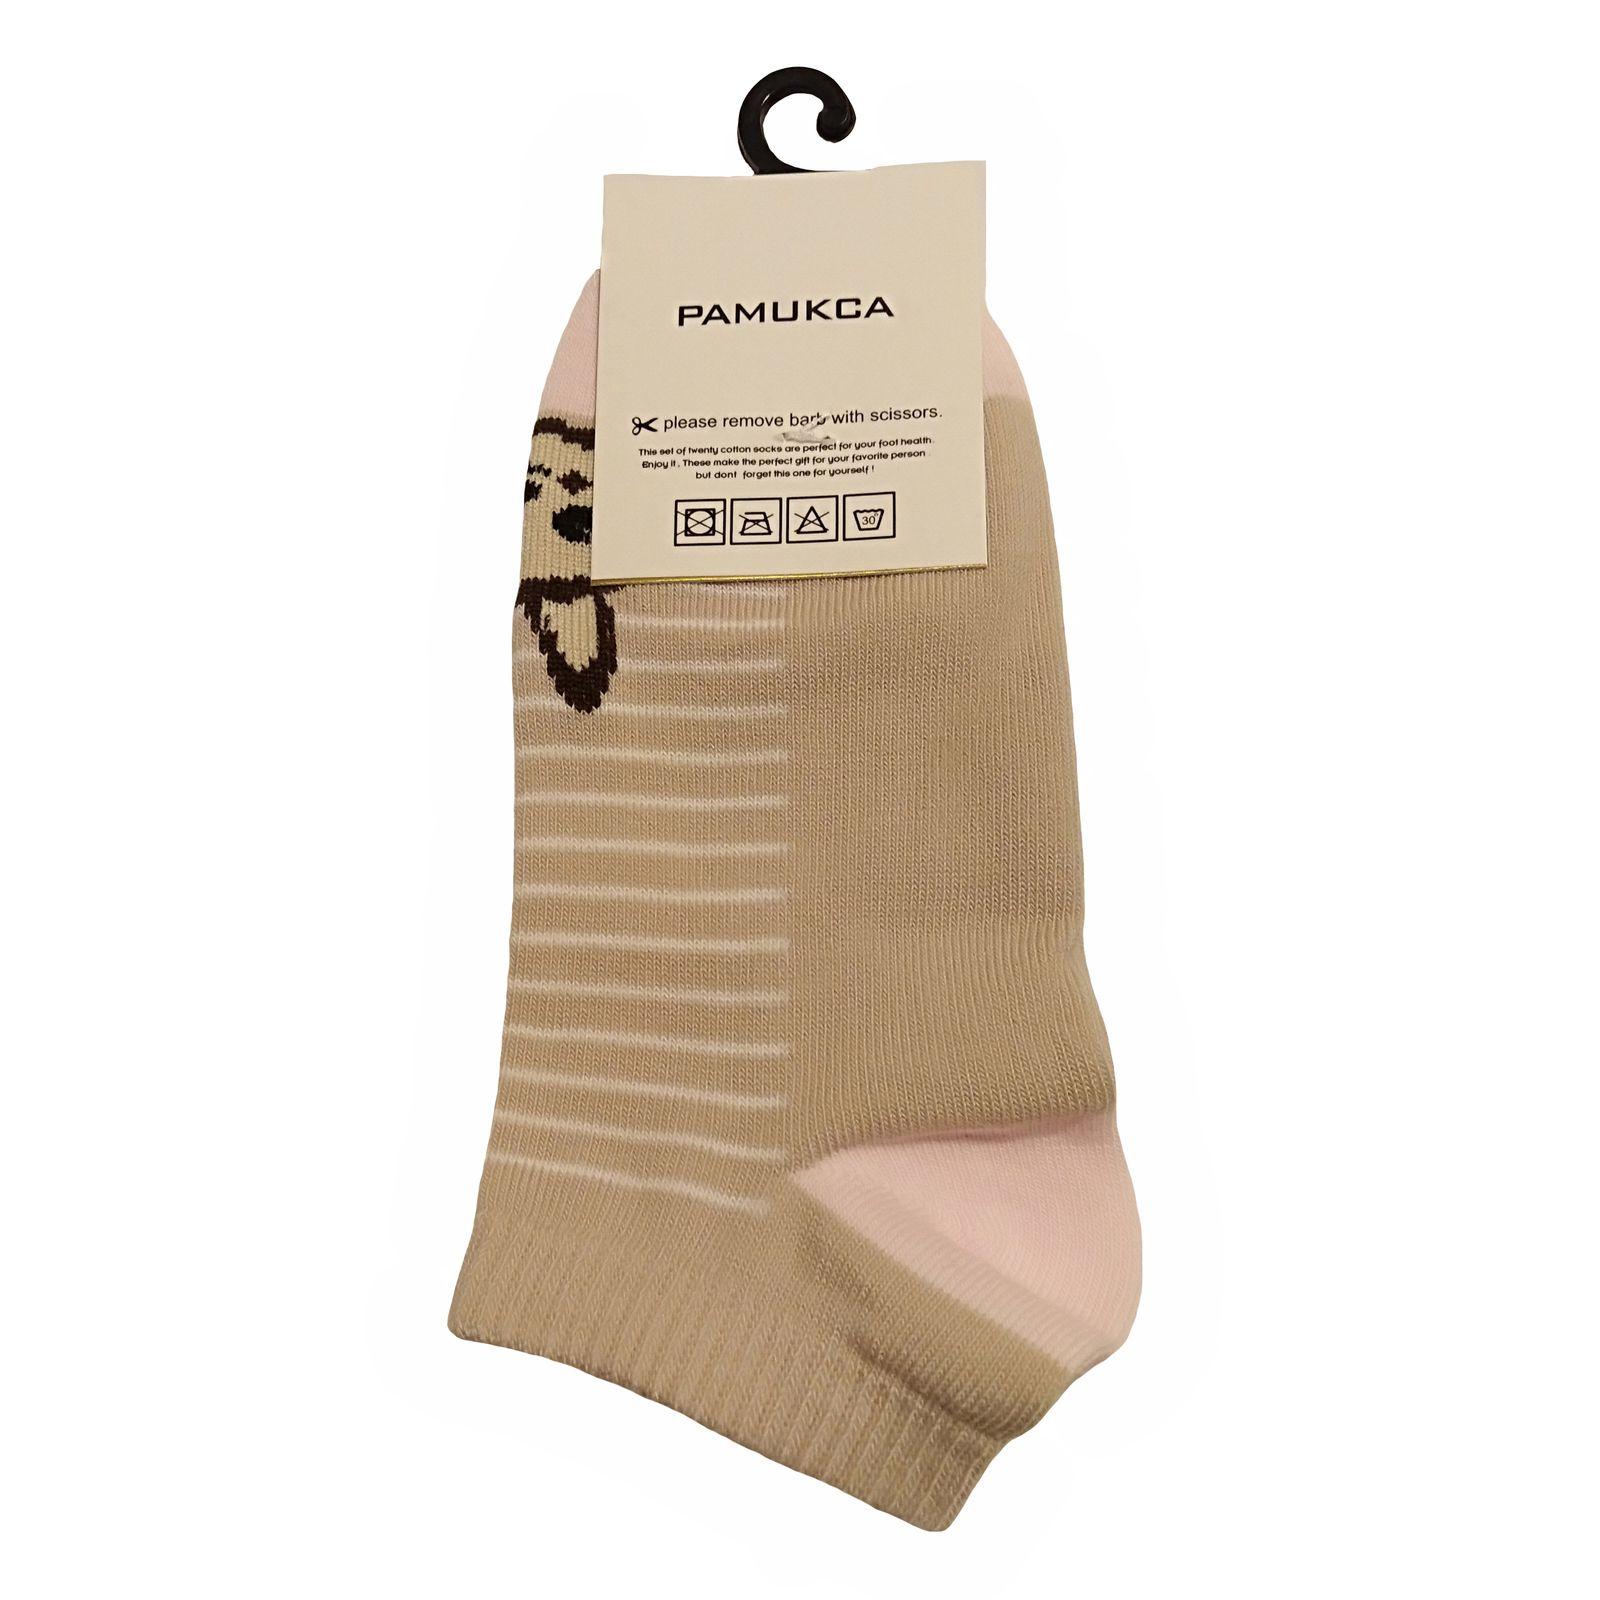 جوراب بچگانه پاموکا مدل A-7 -  - 2